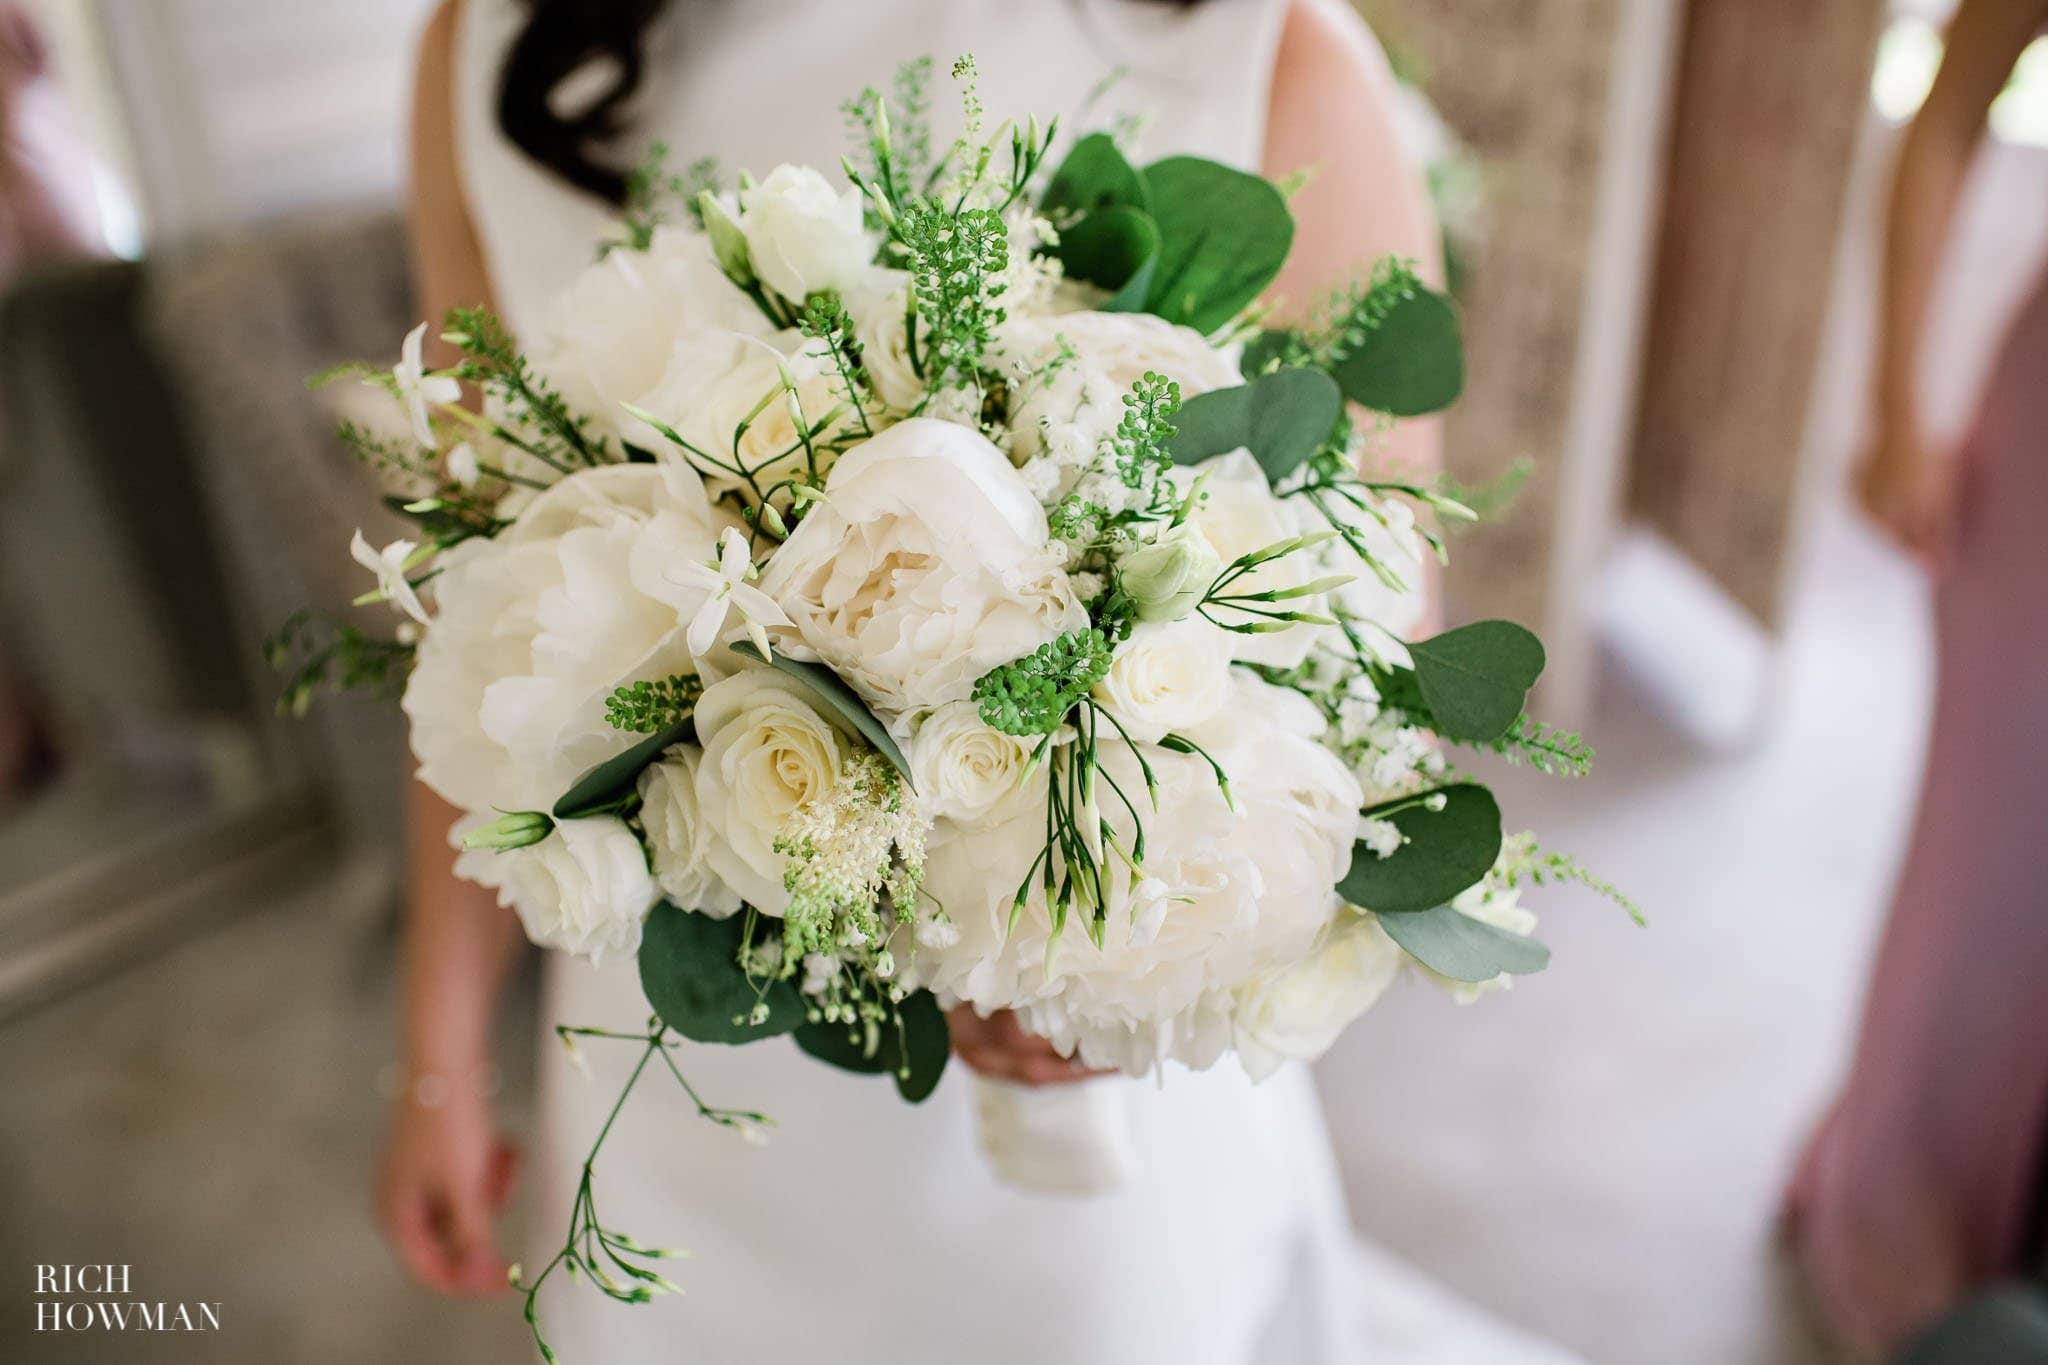 Hedsor House Wedding Photographer in Berkshire 32